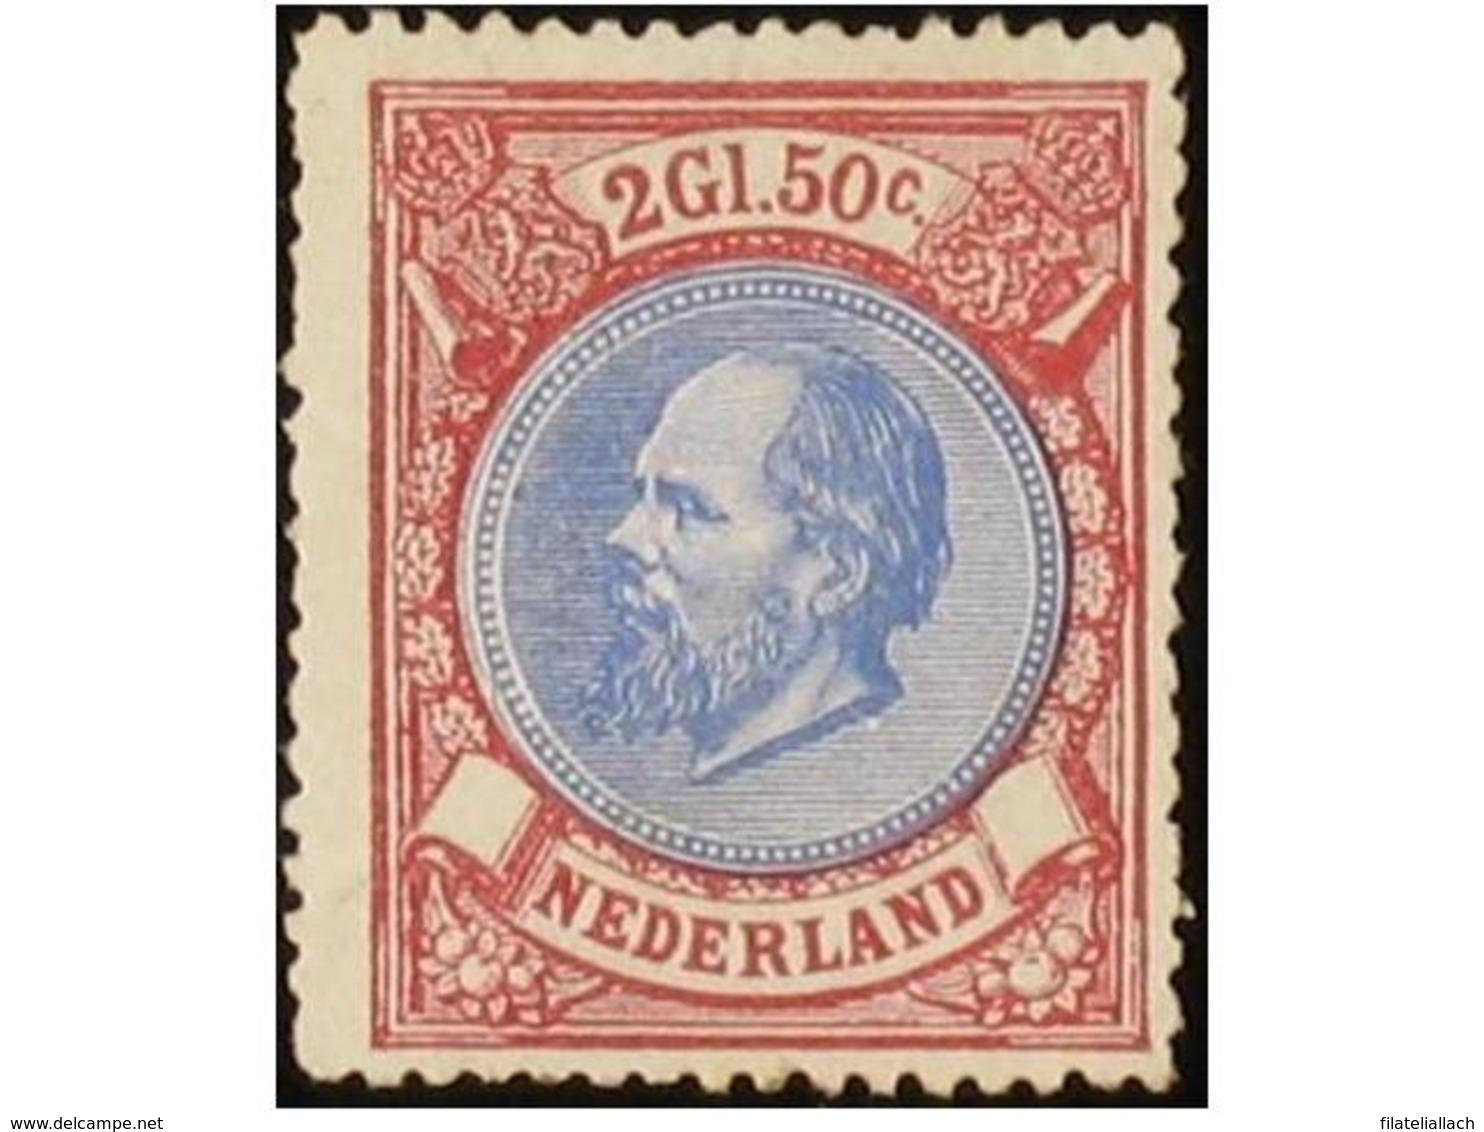 NETHERLANDS - Pays-Bas